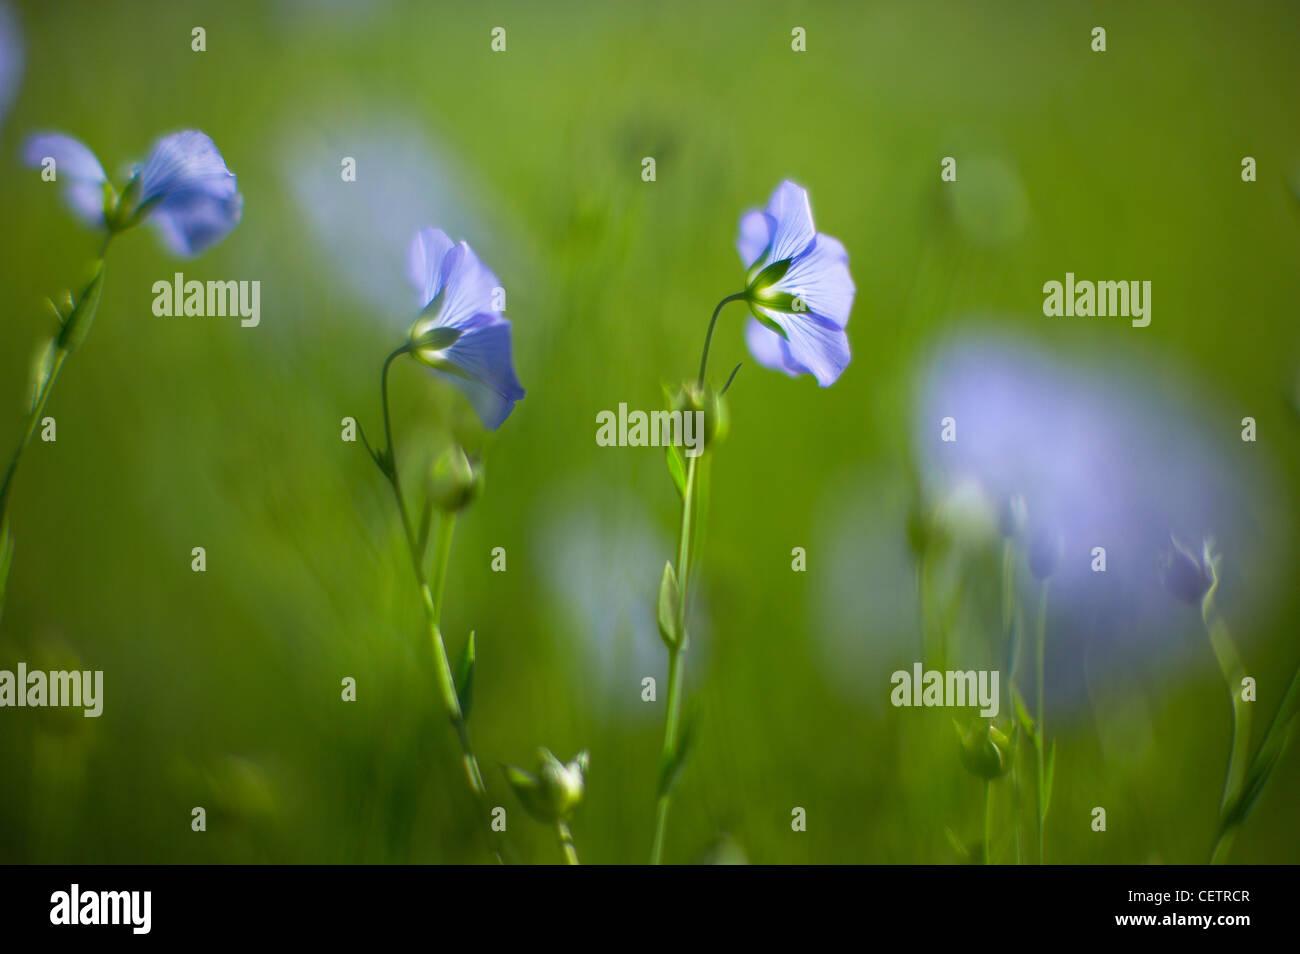 a field of flax nr Stourton Caundle, Dorset, England, UK - Stock Image